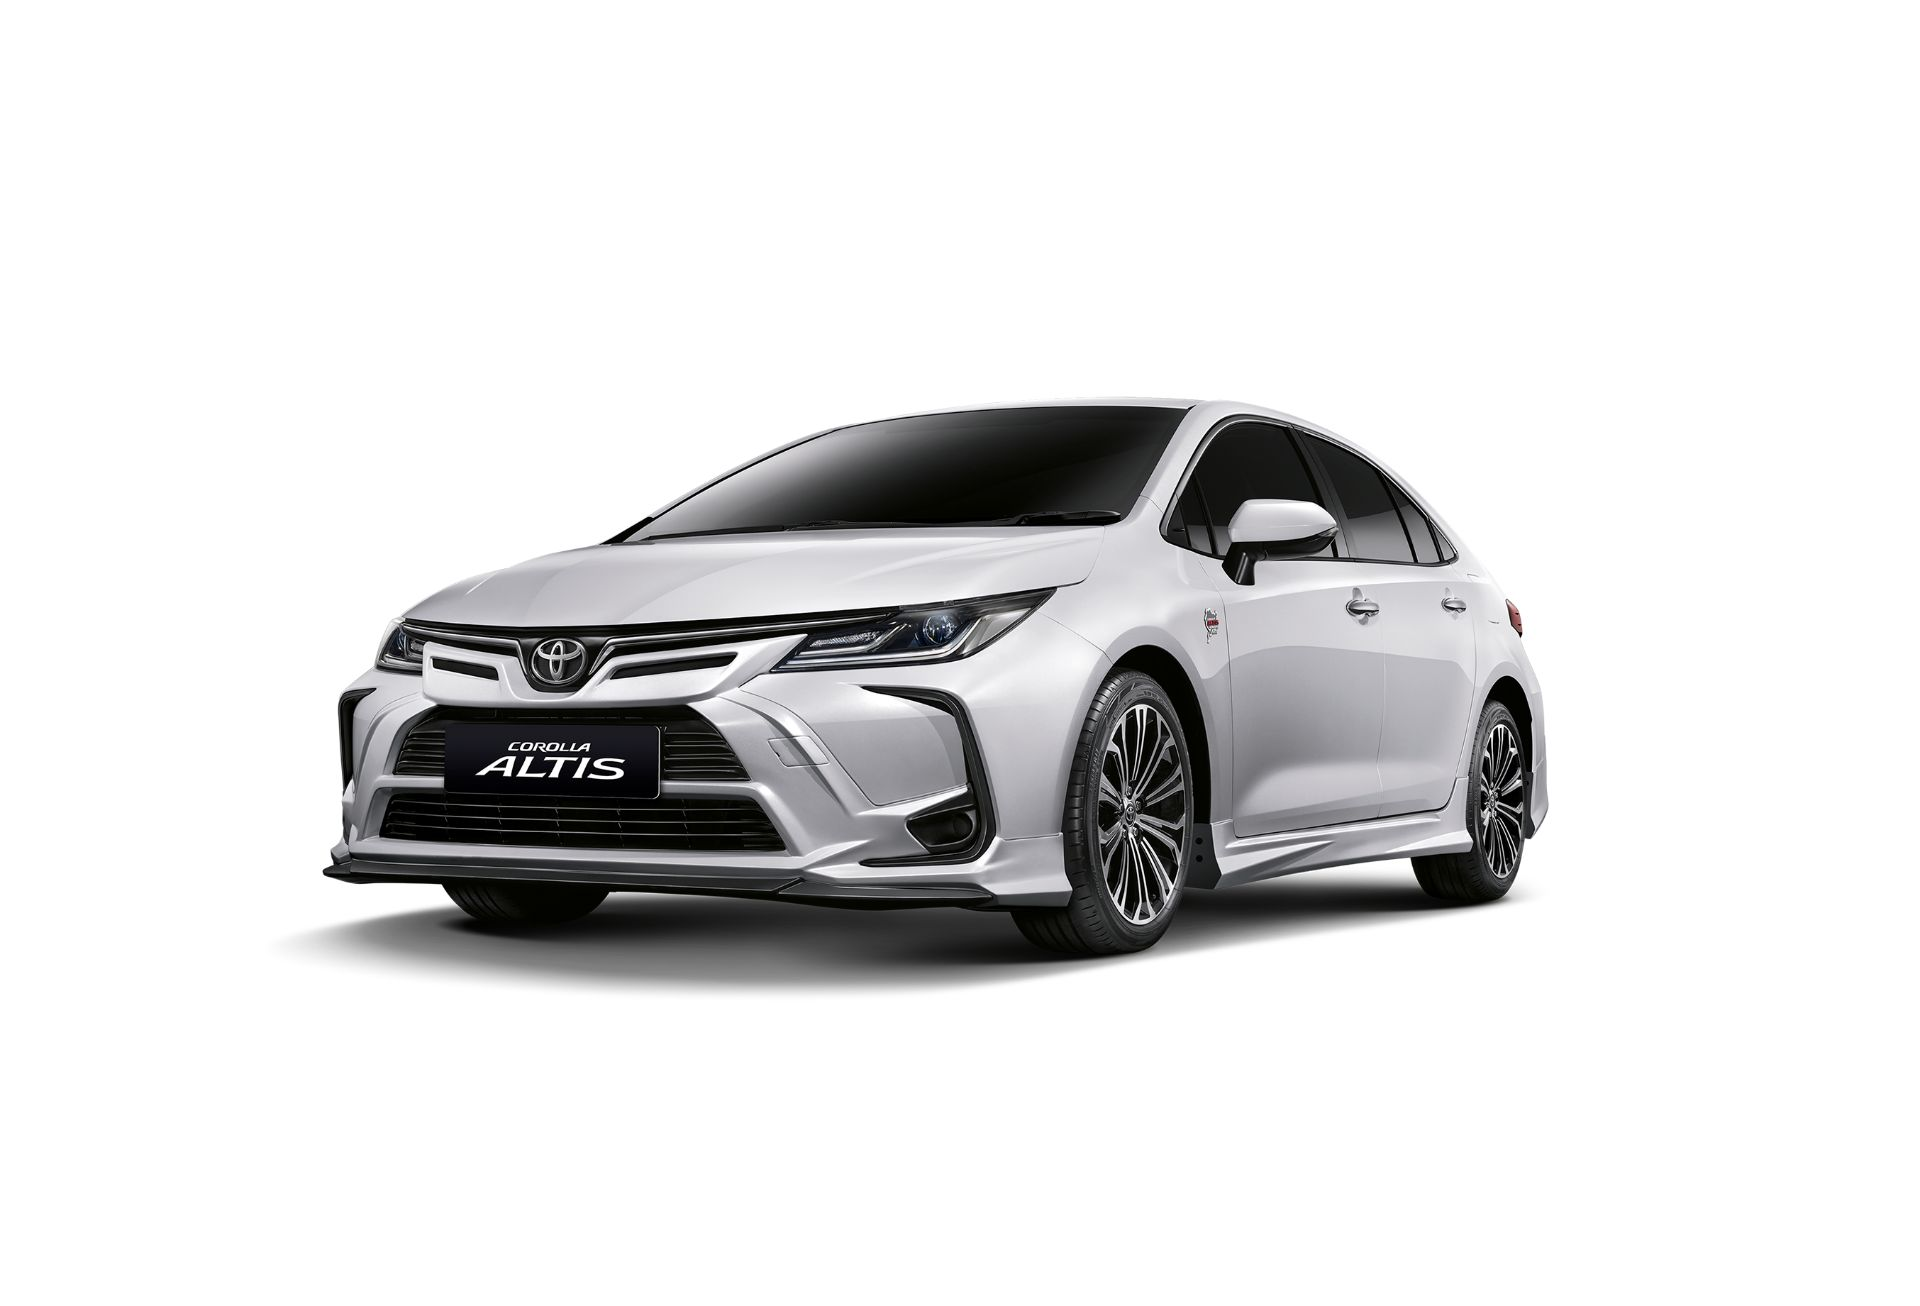 1_Toyota-Corolla-Altis-Nurburgring-Edition-1